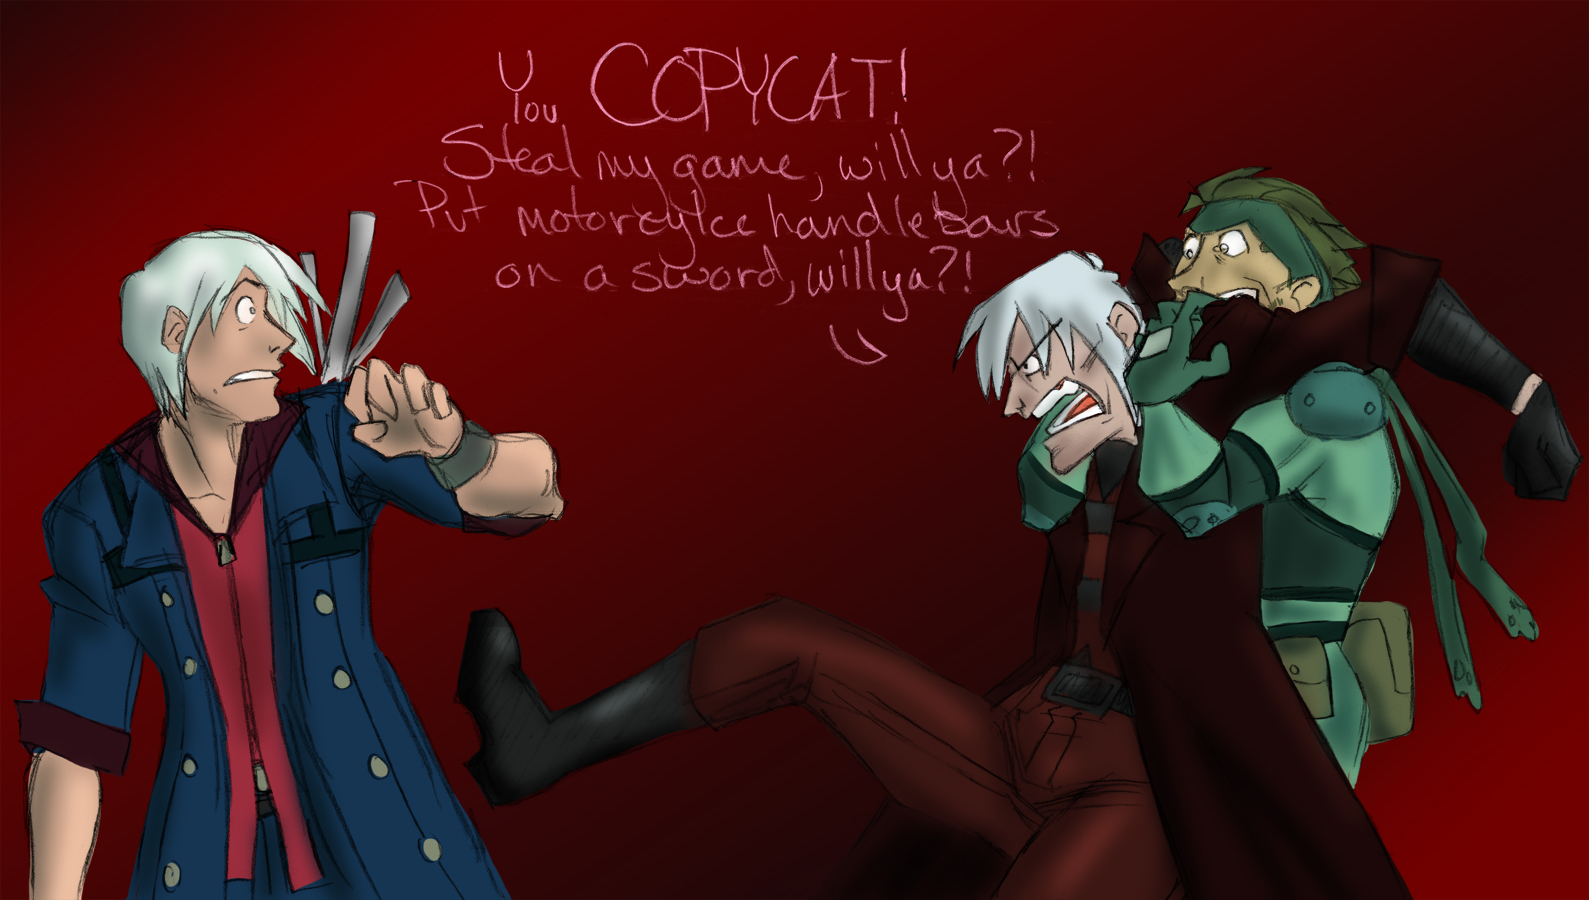 Dante_hates_Nero_by_Oboe.jpg